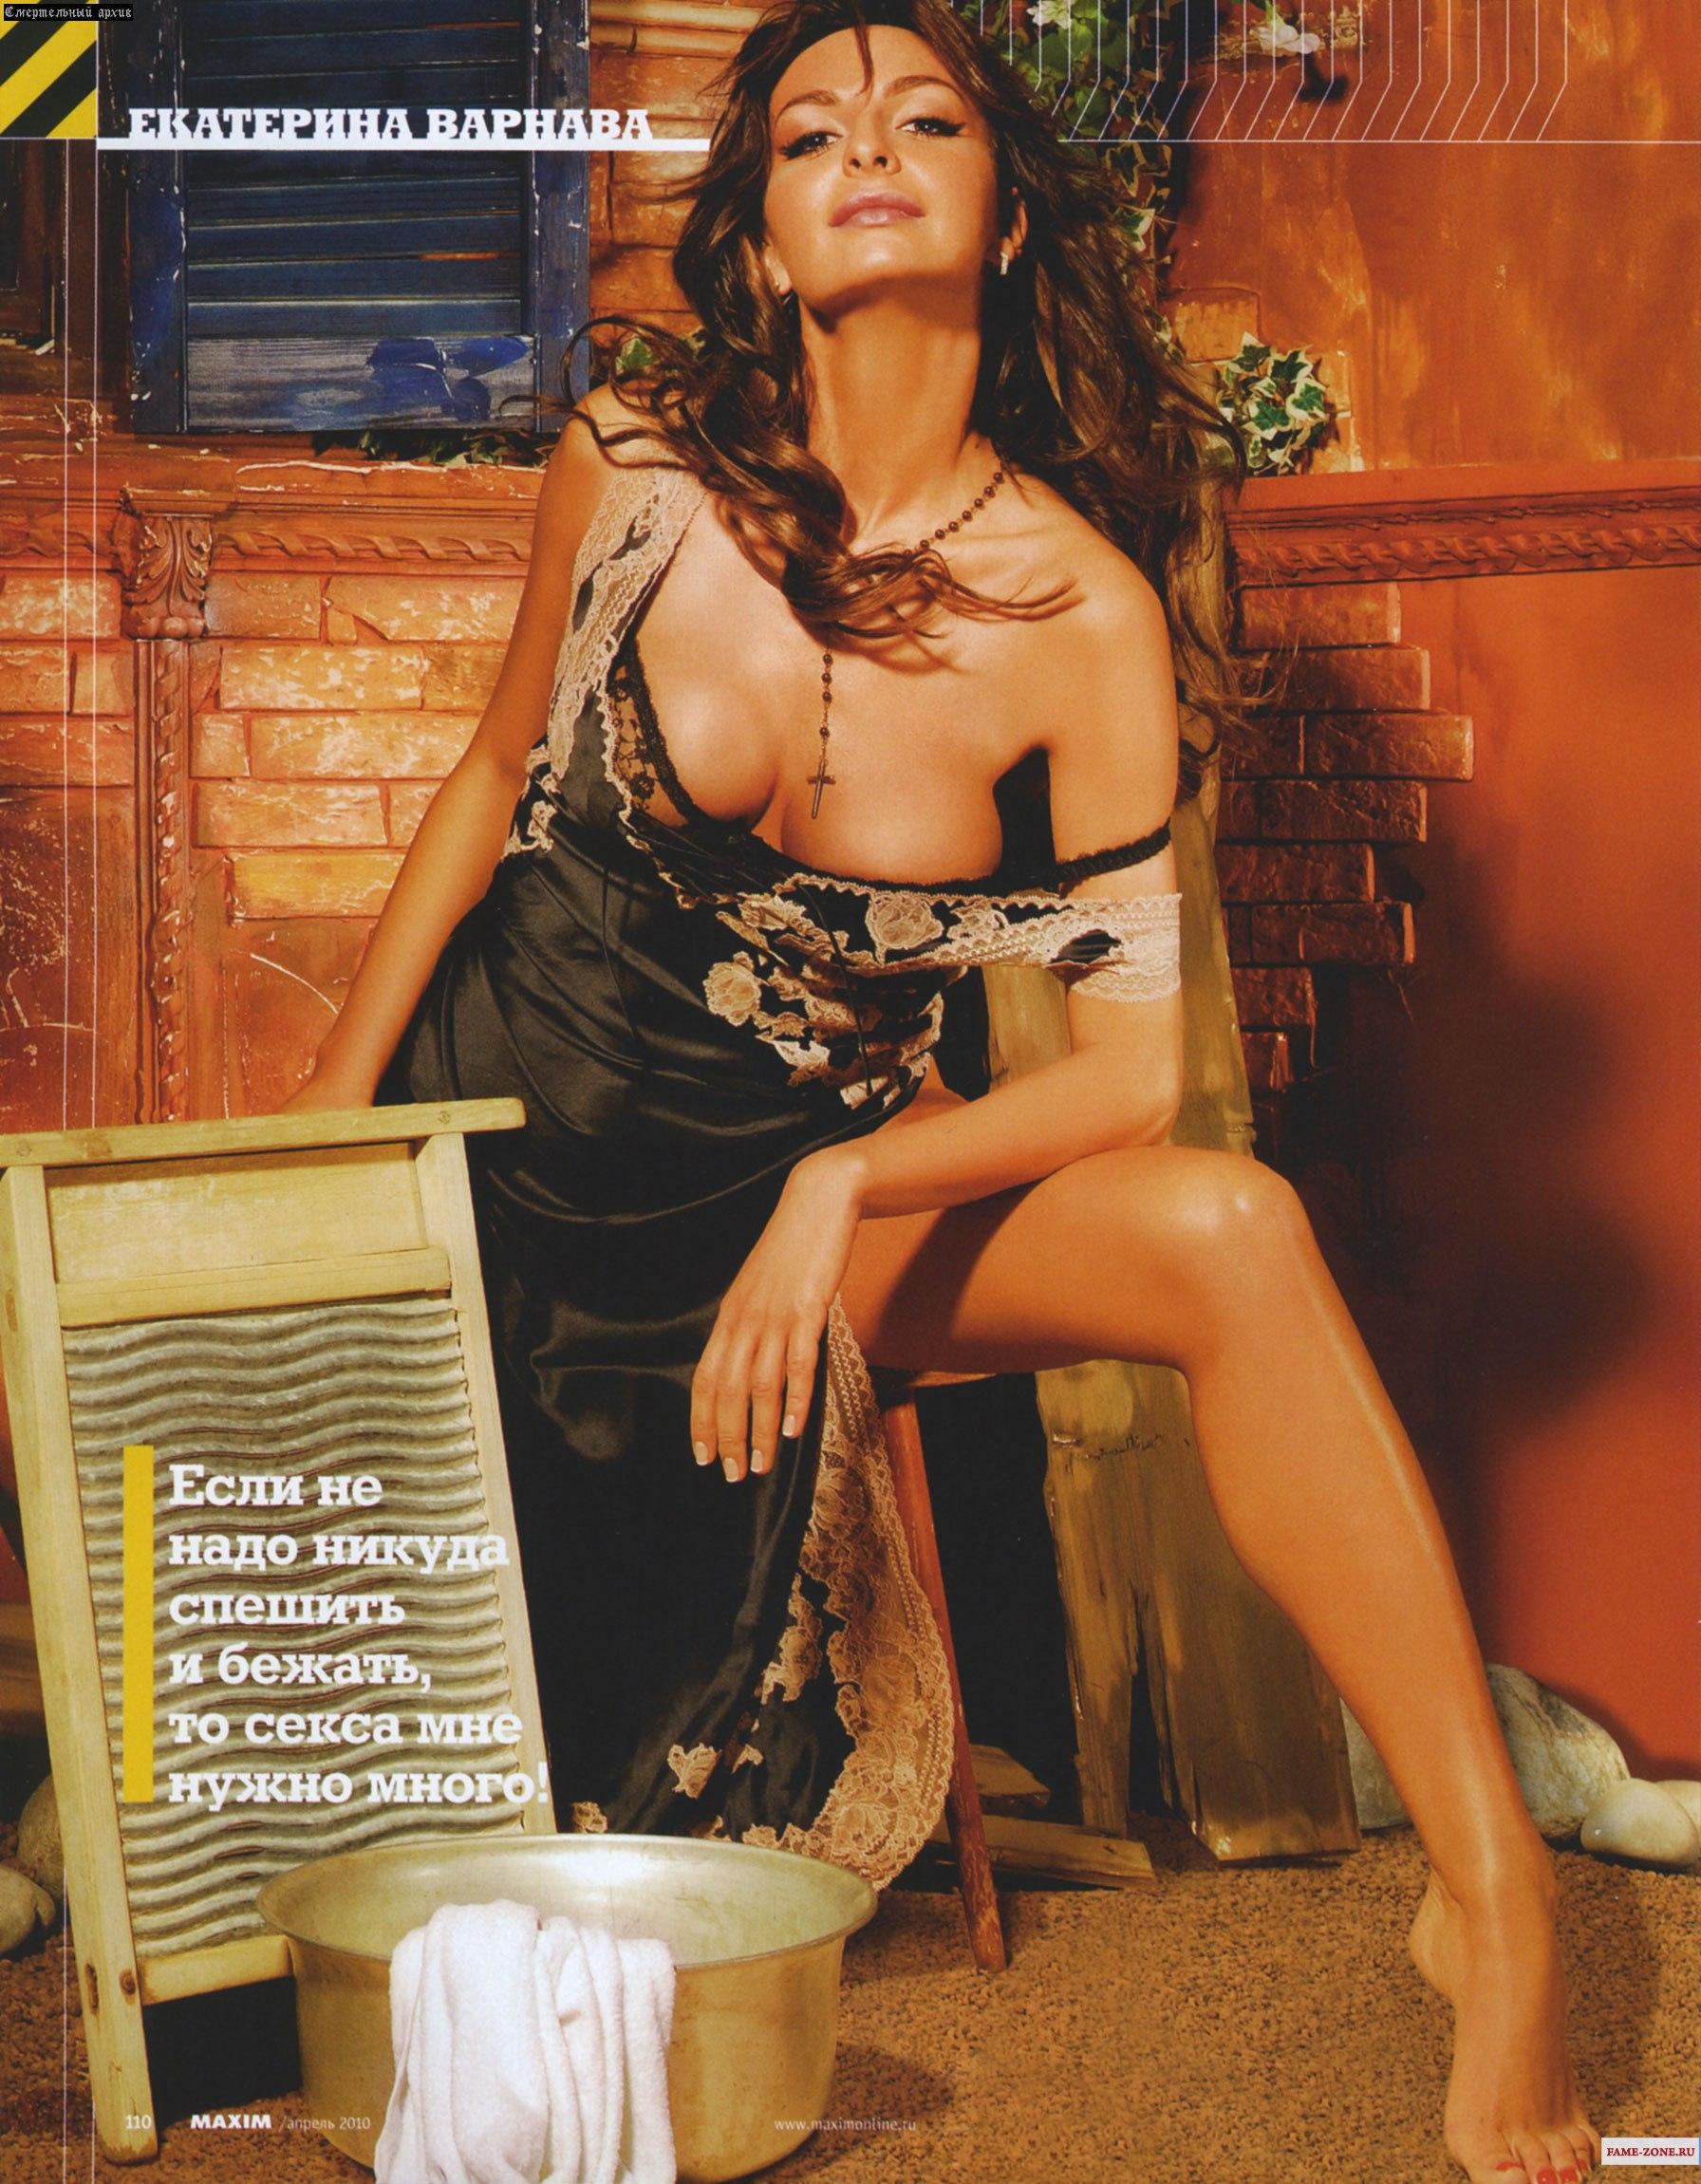 Журнал Maxim приобнажил секс-символ Comedy Woman - Катю Варнаву.